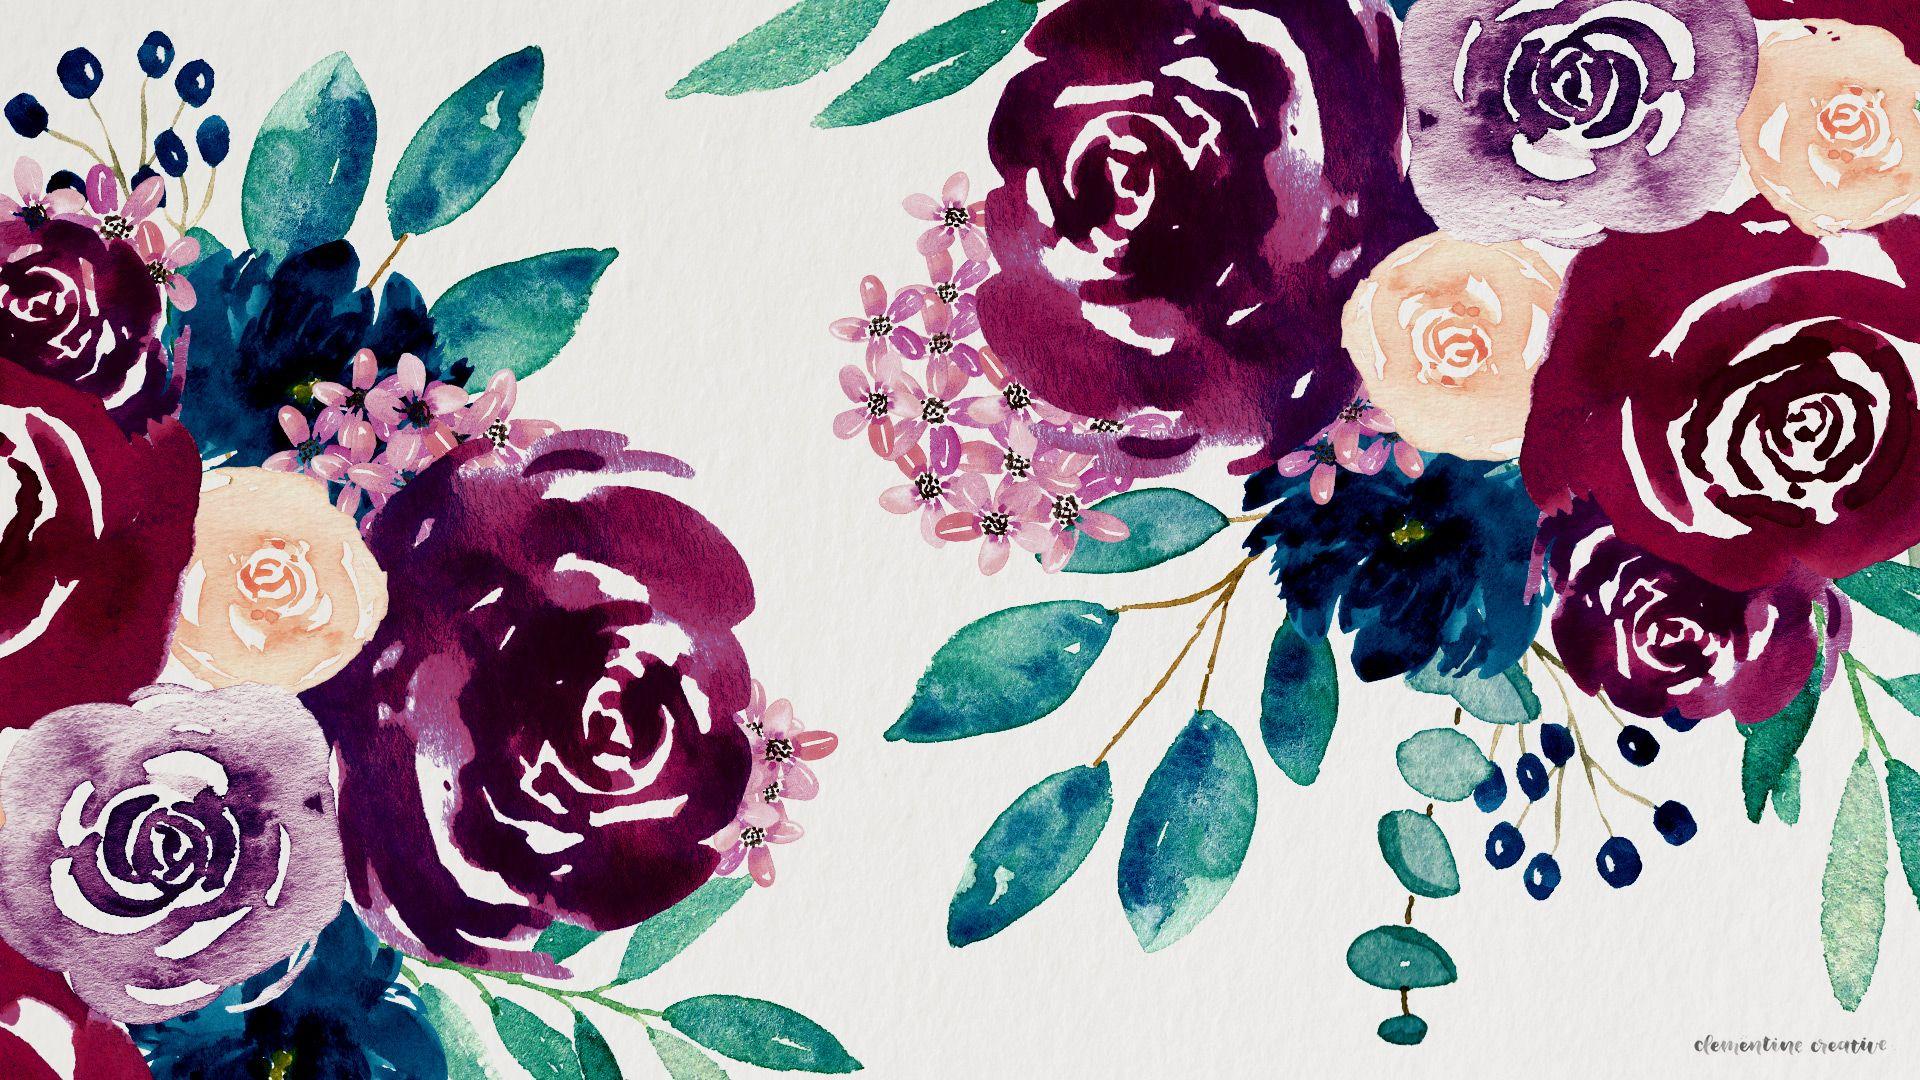 watercolourflowersdesktop.jpg 1,920×1,080 pixels